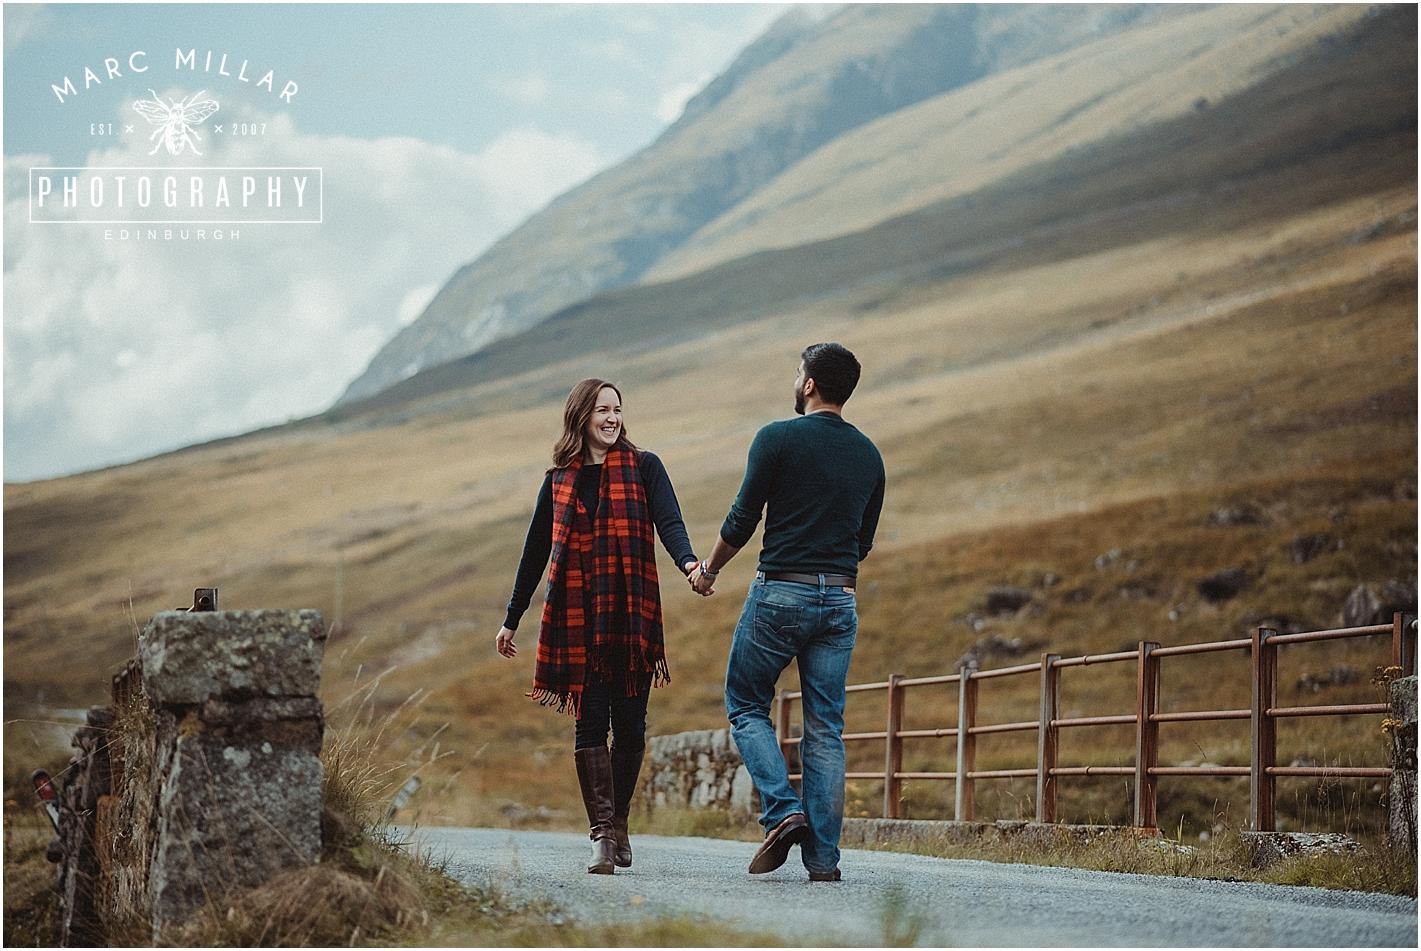 Scottish Wedding photographer by Marc Millar Photography